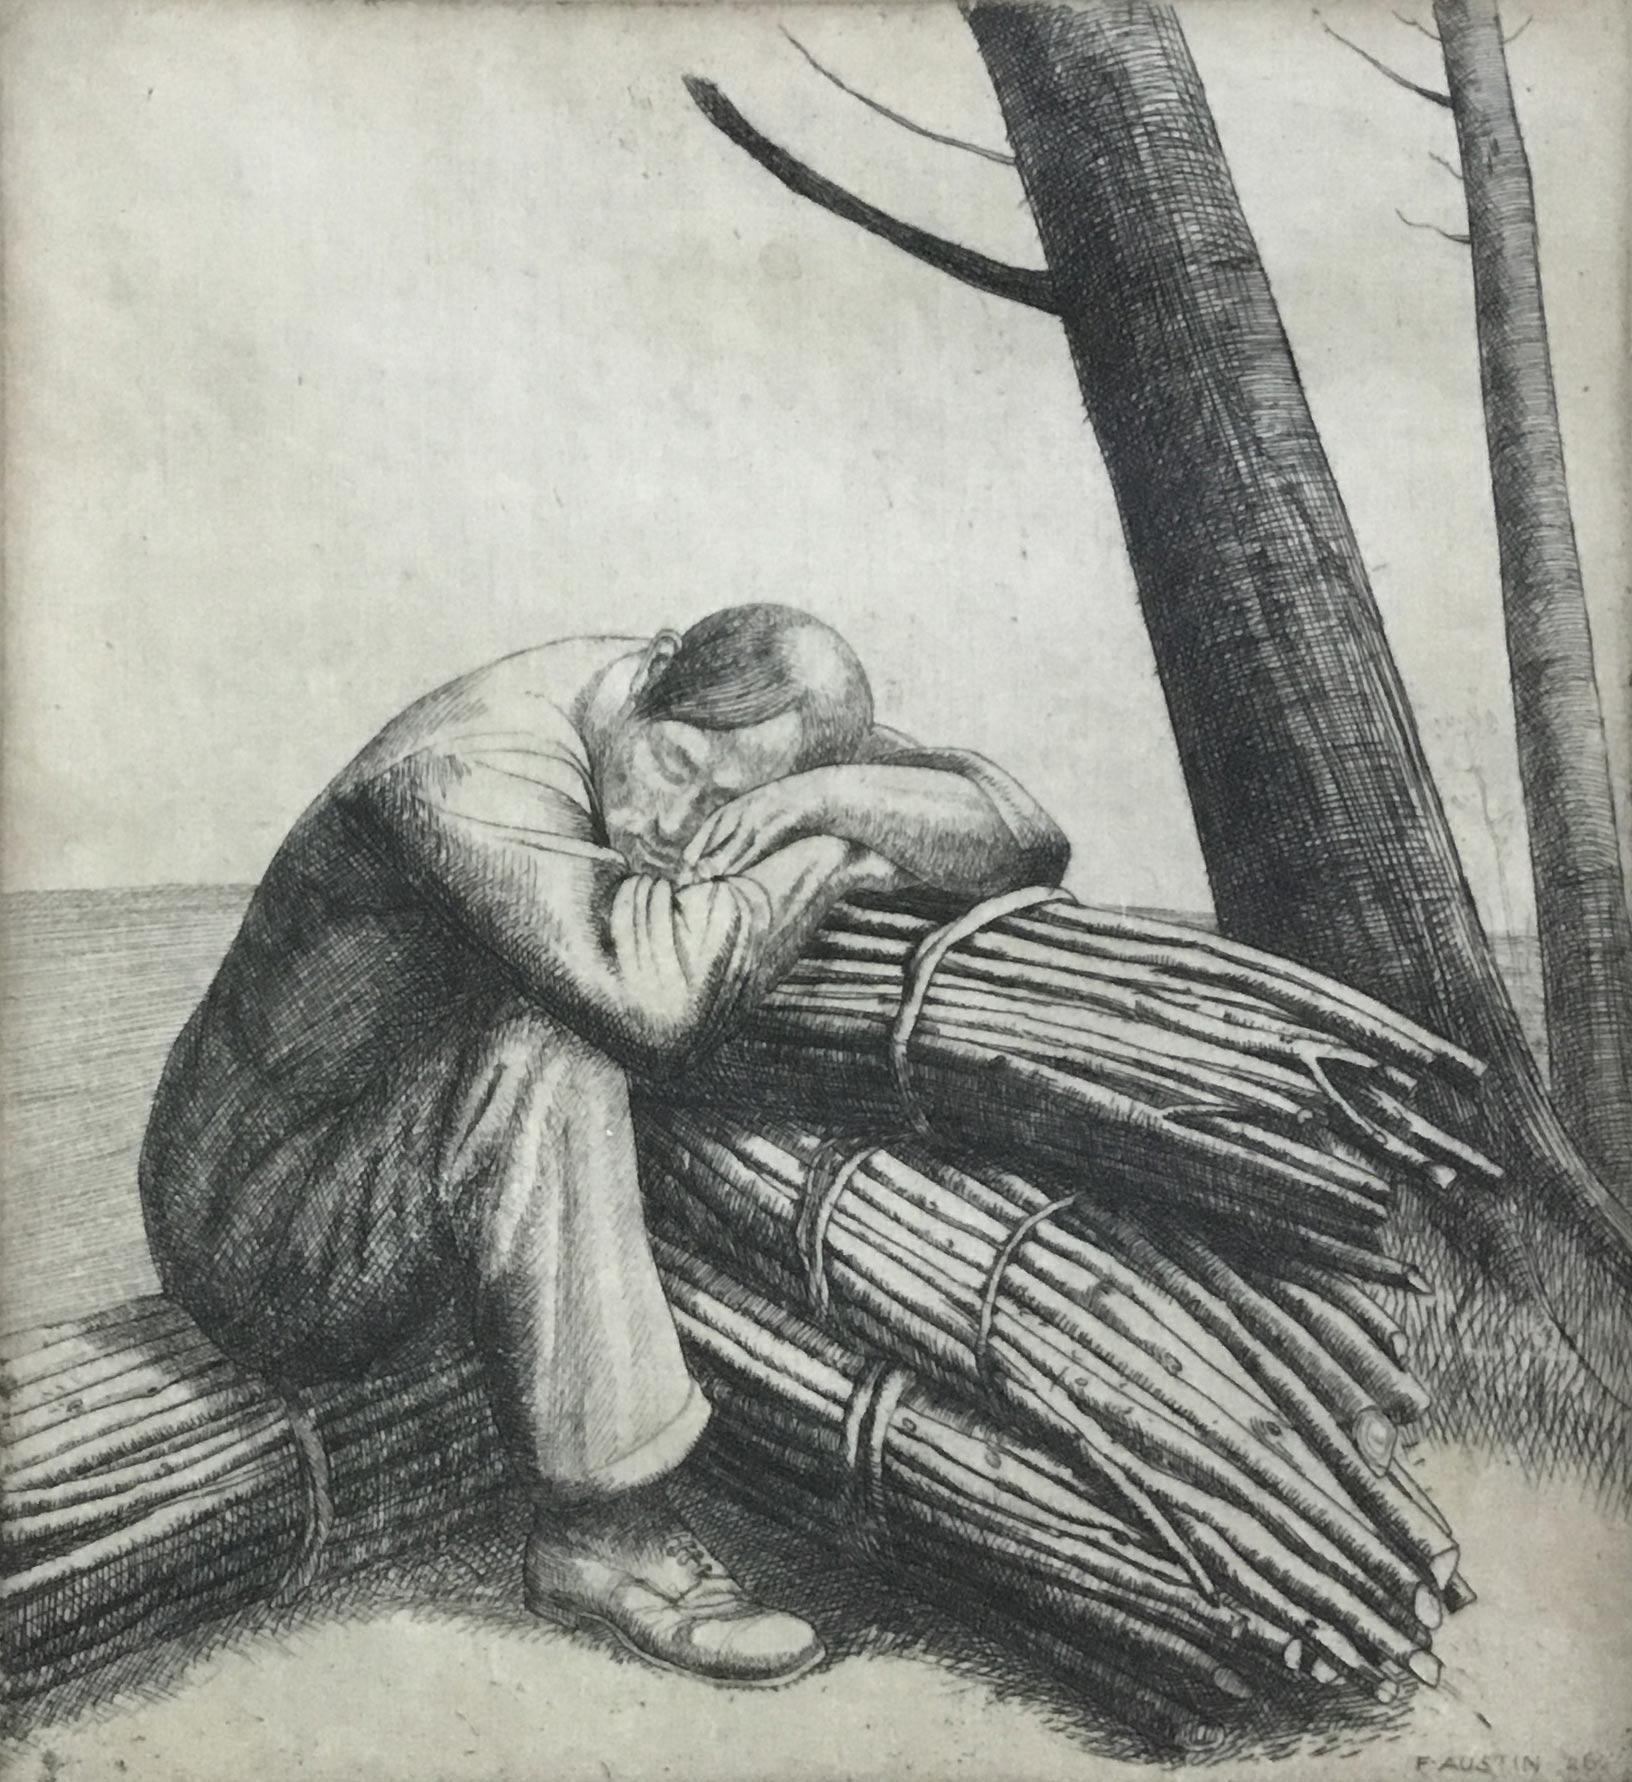 FREDERICK AUSTIN (b. 1902)